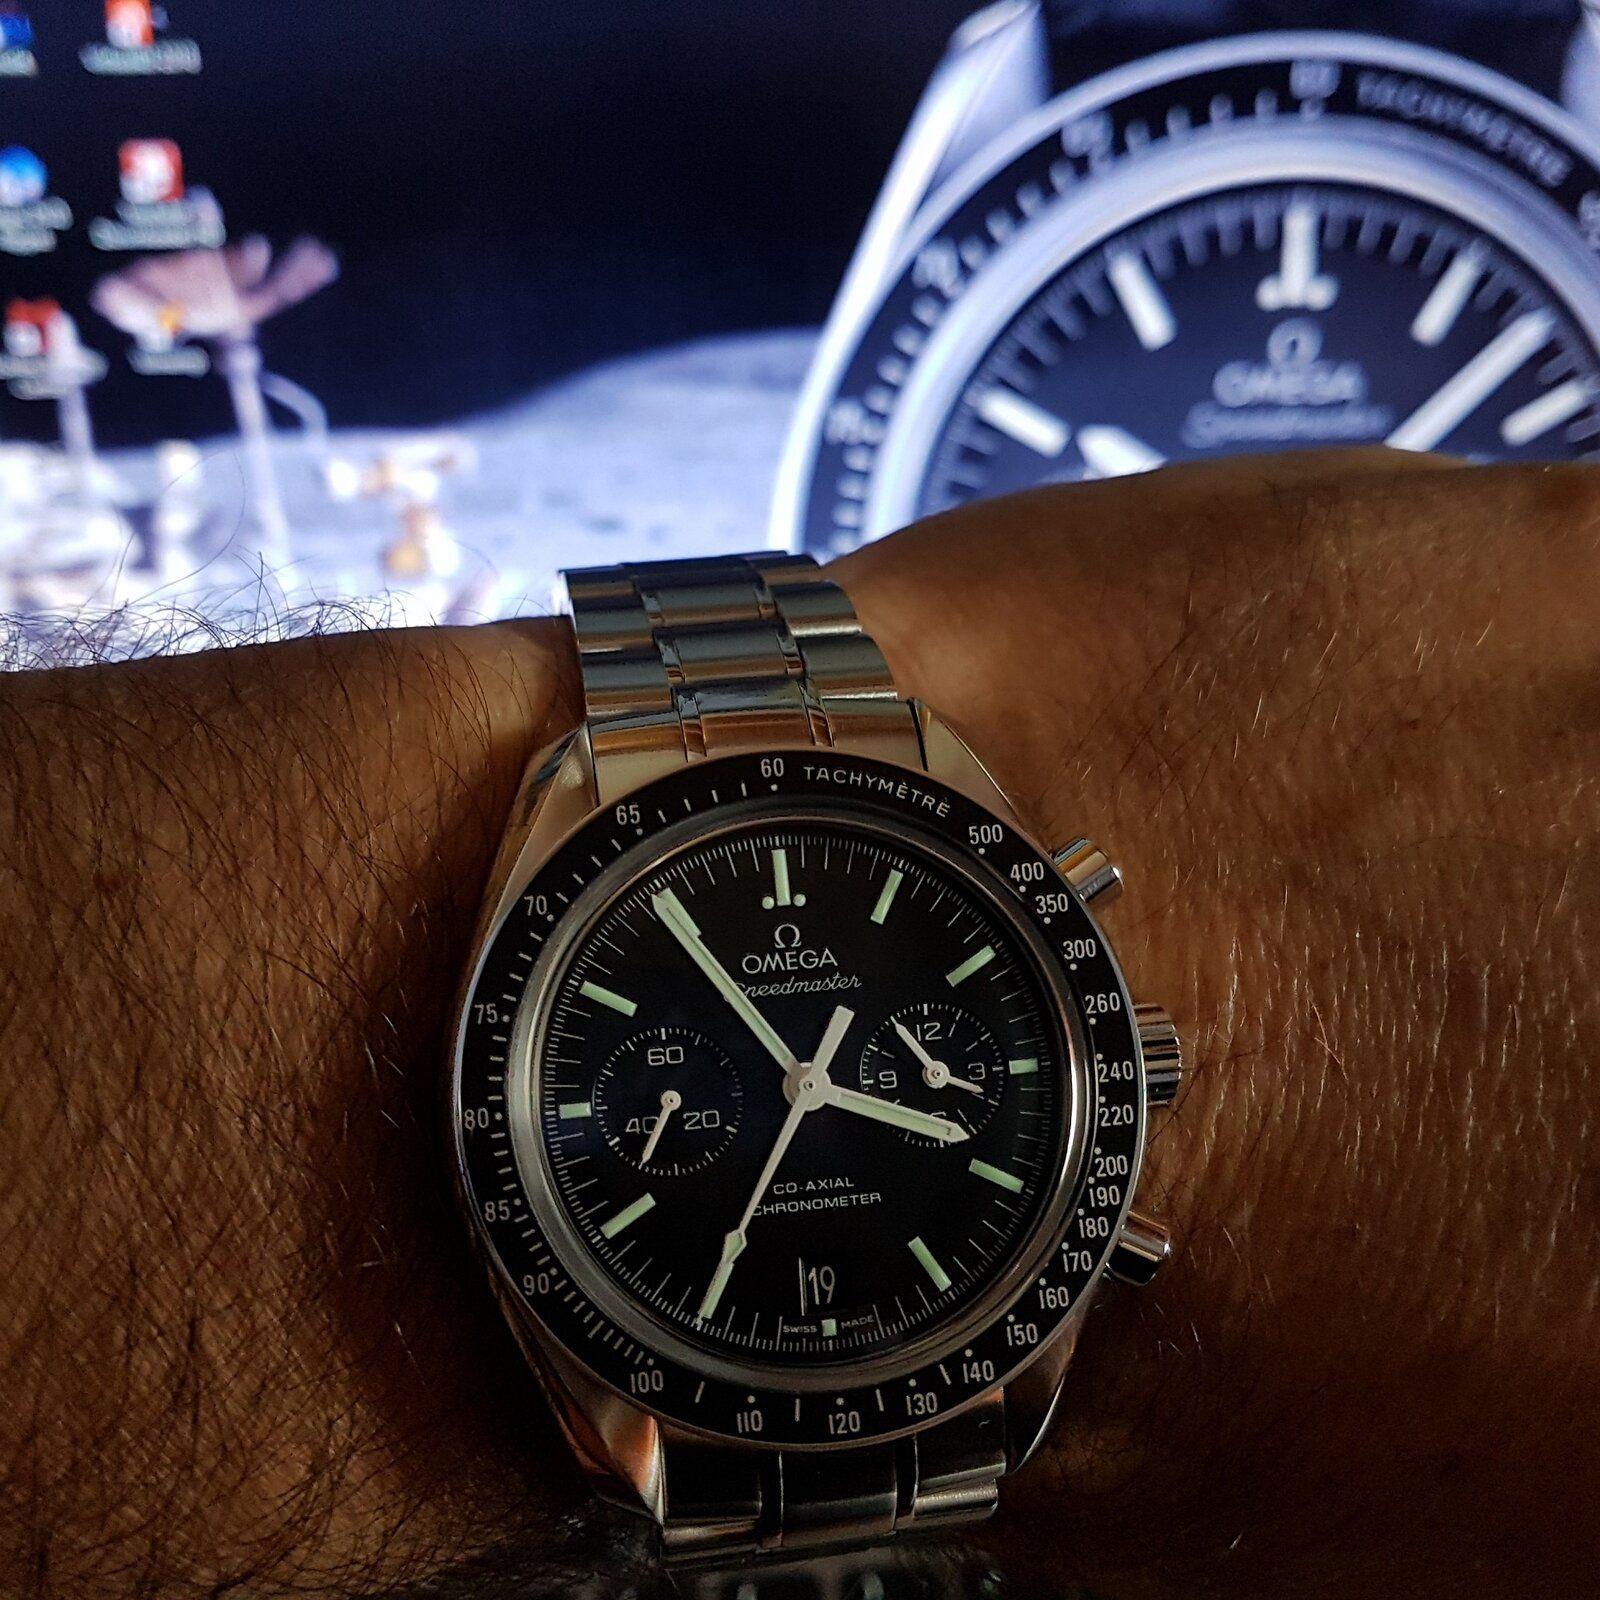 Omega Speedmaster Moonwatch Co-Axial Chronograph 44.25 mm Ref. 311.30.44.51 (2).jpg